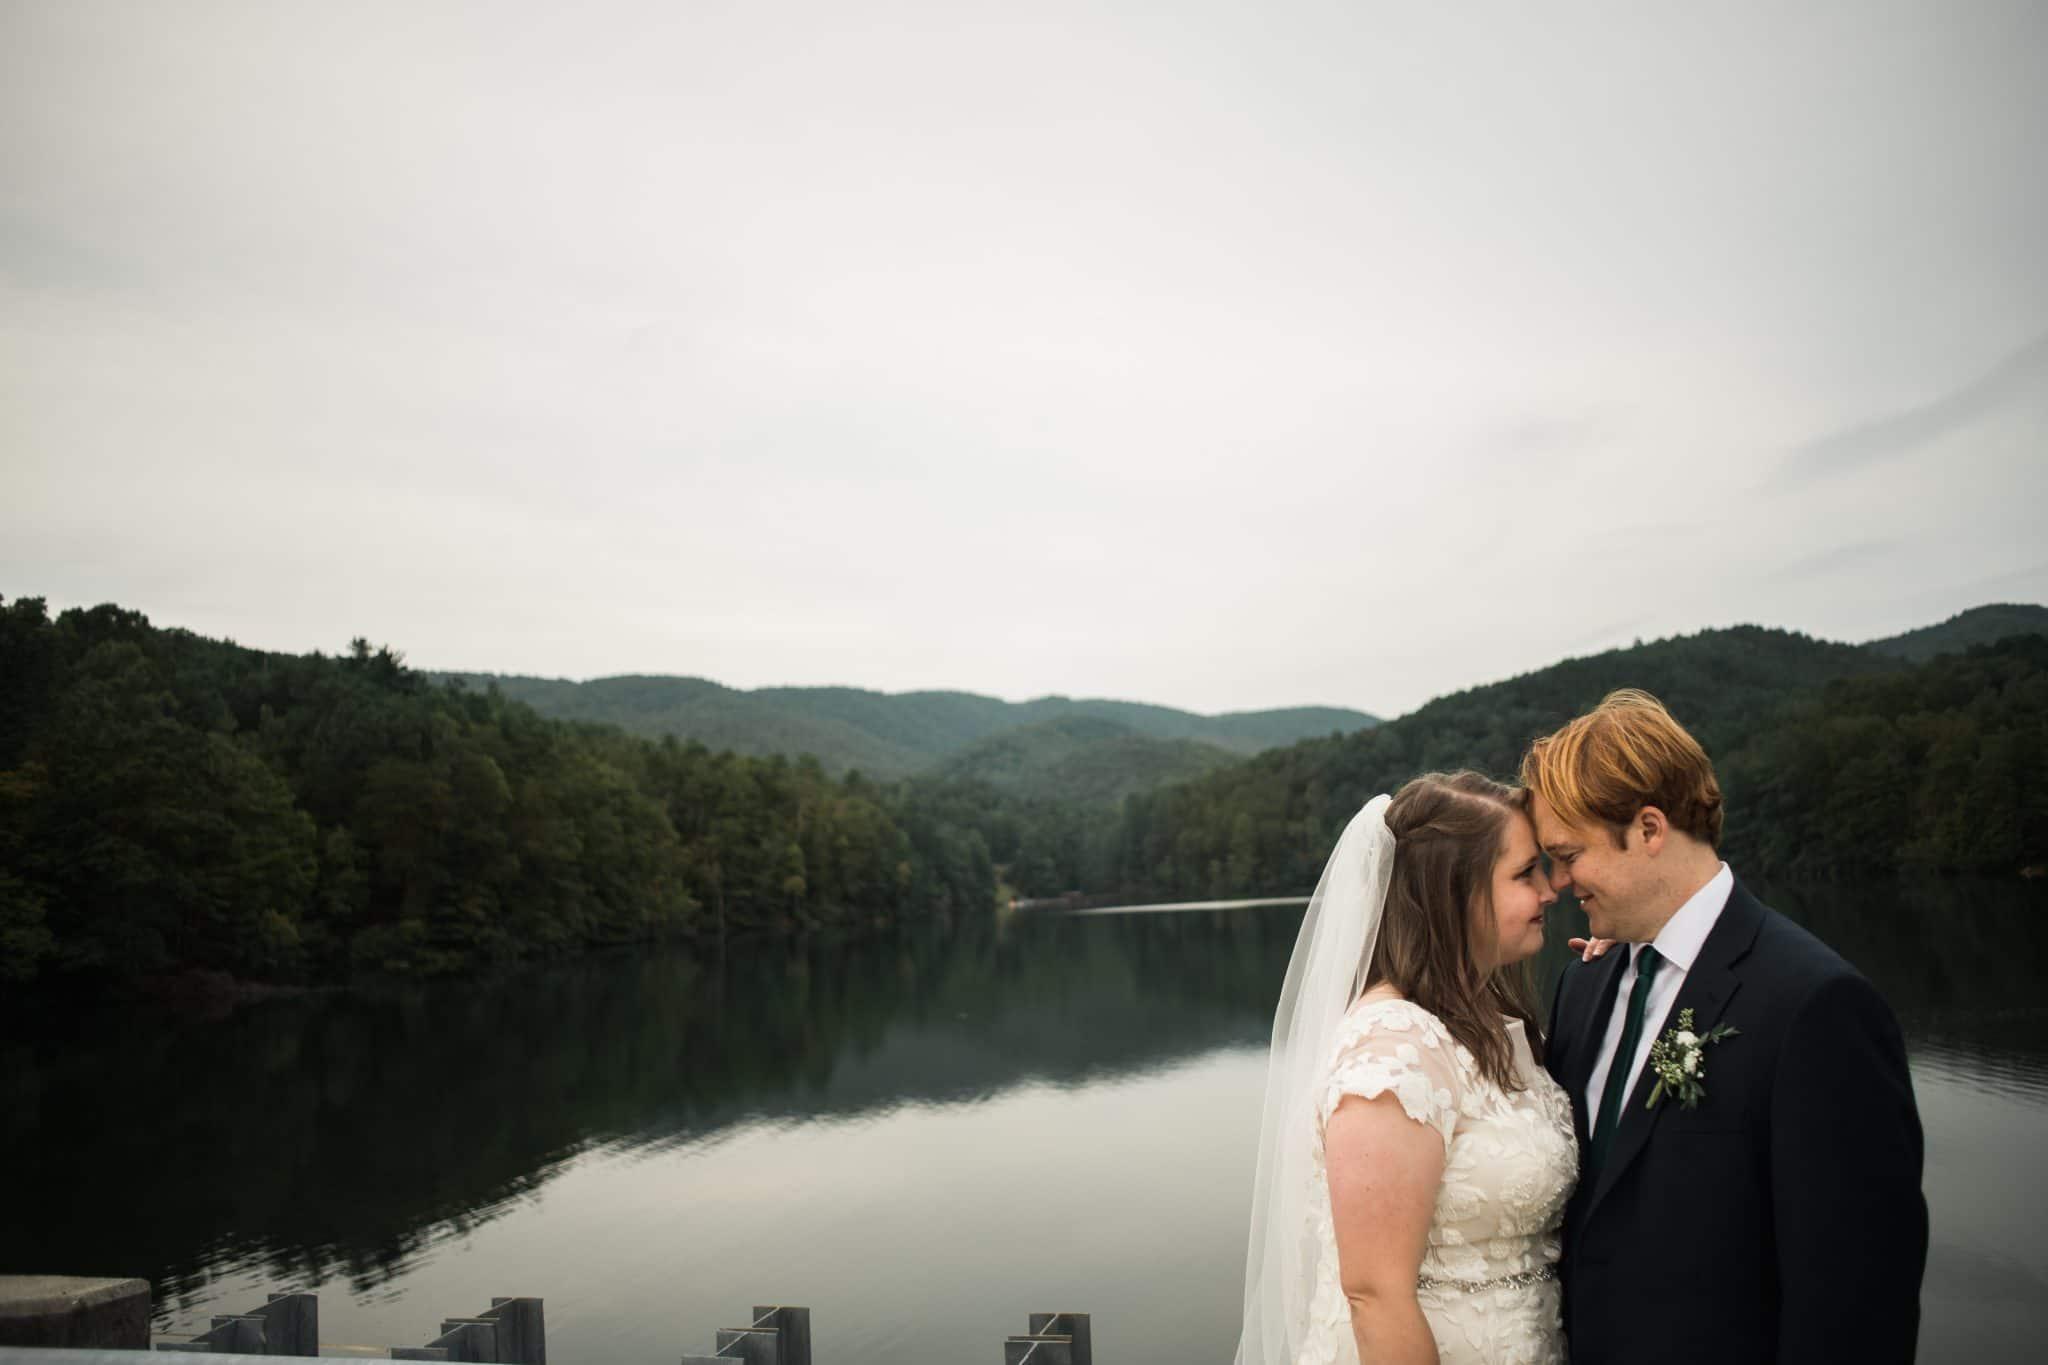 Unicoi State Park Adventure wedding overlooking the water